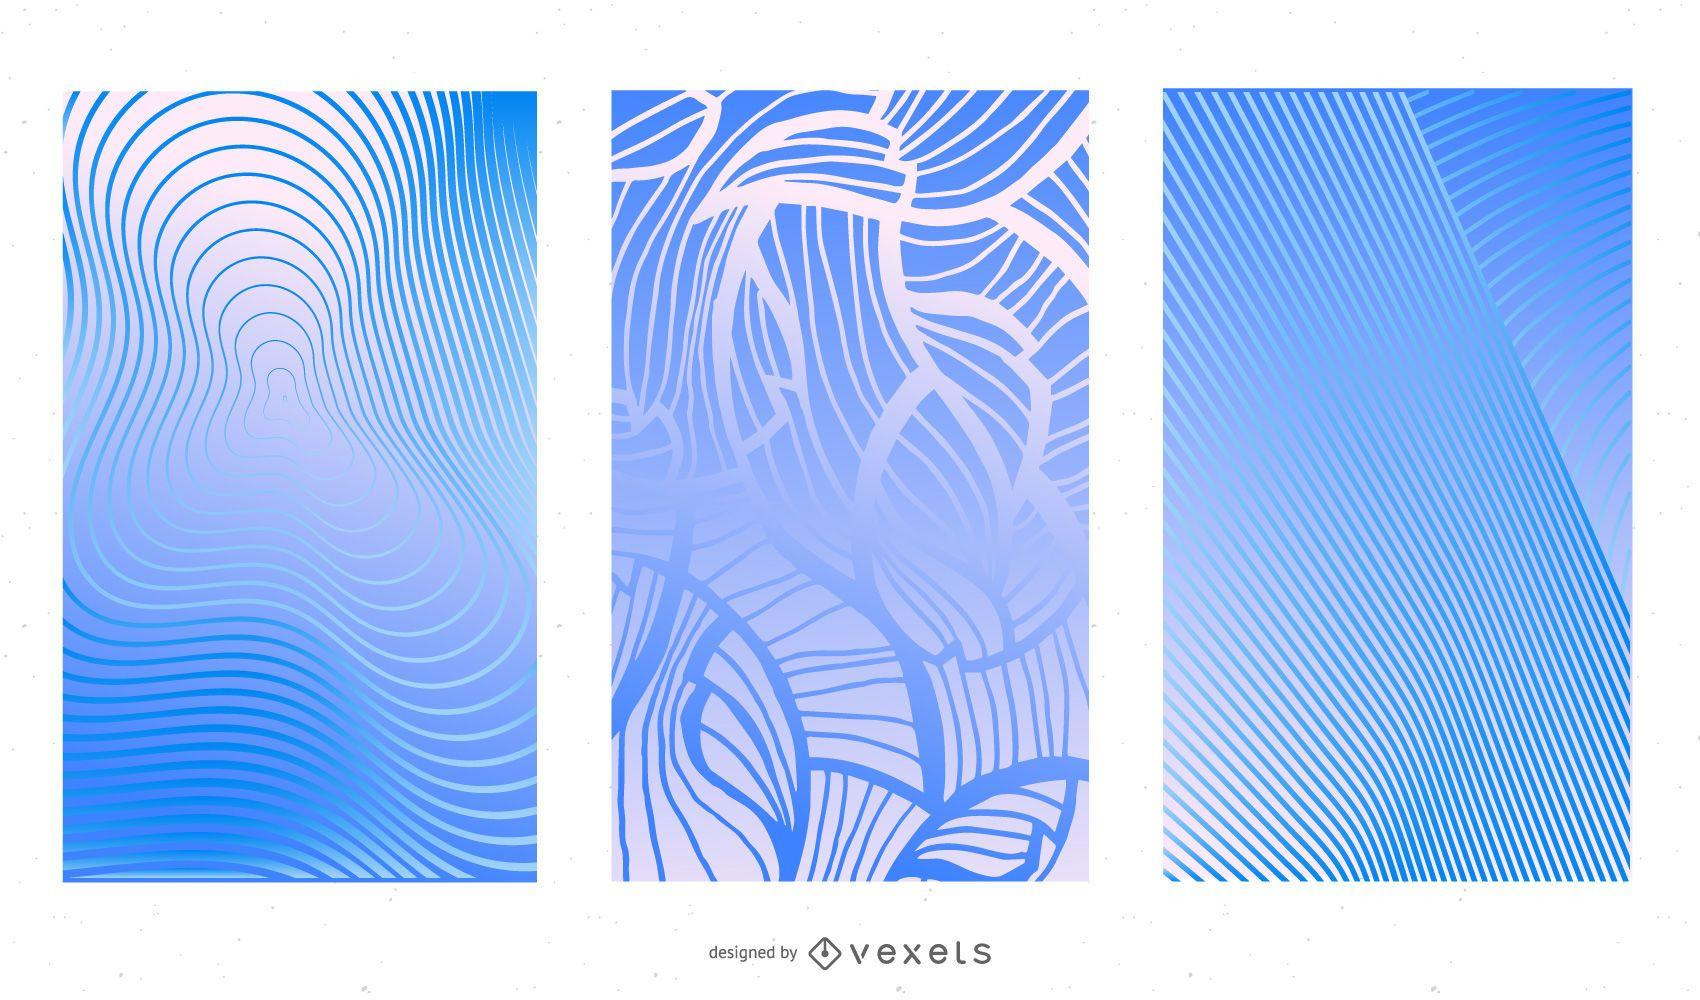 Elegante fondo abstracto azul con líneas